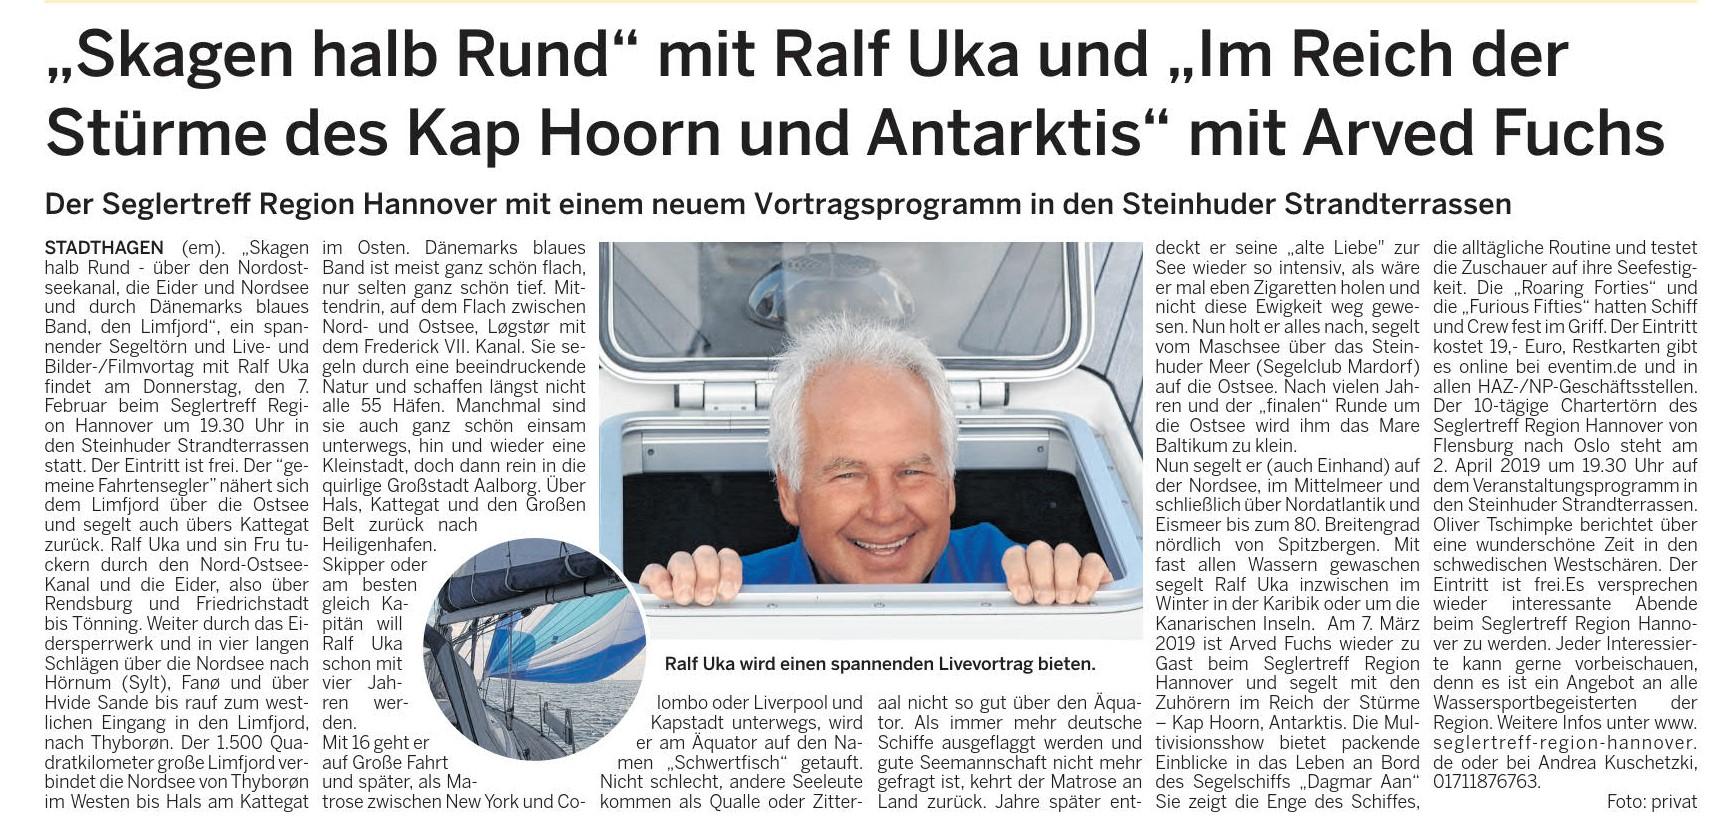 Wunstorfer Stadtanzeiger, 17.01.2019